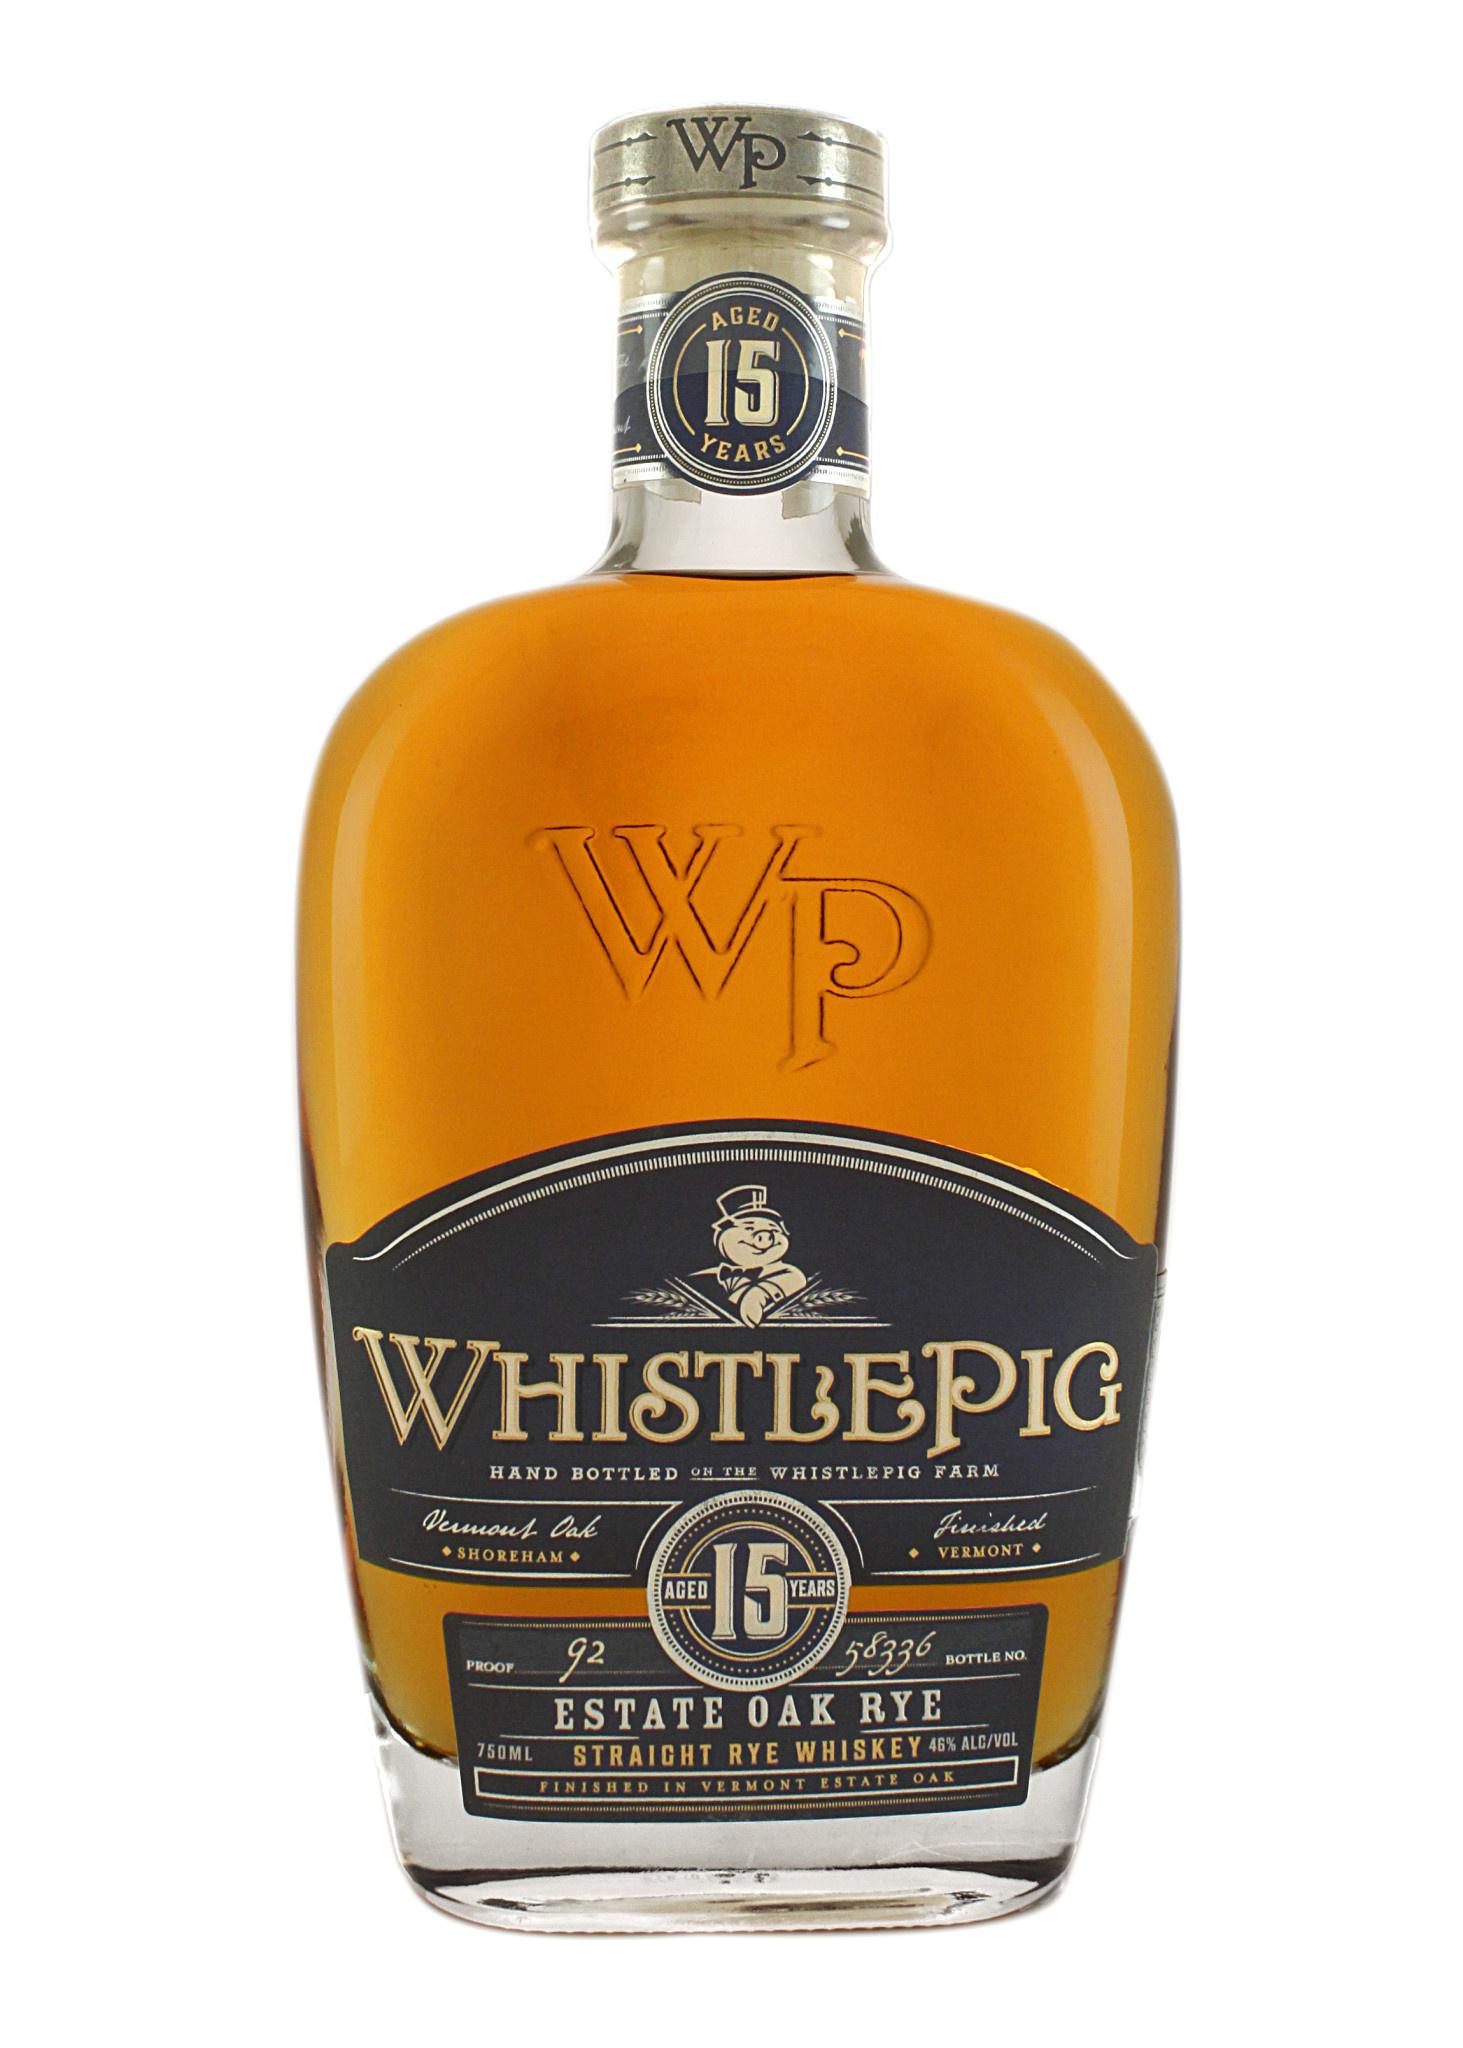 Whistlepig Estate Oak Rye Straight Rye Whiskey Aged 15 Years